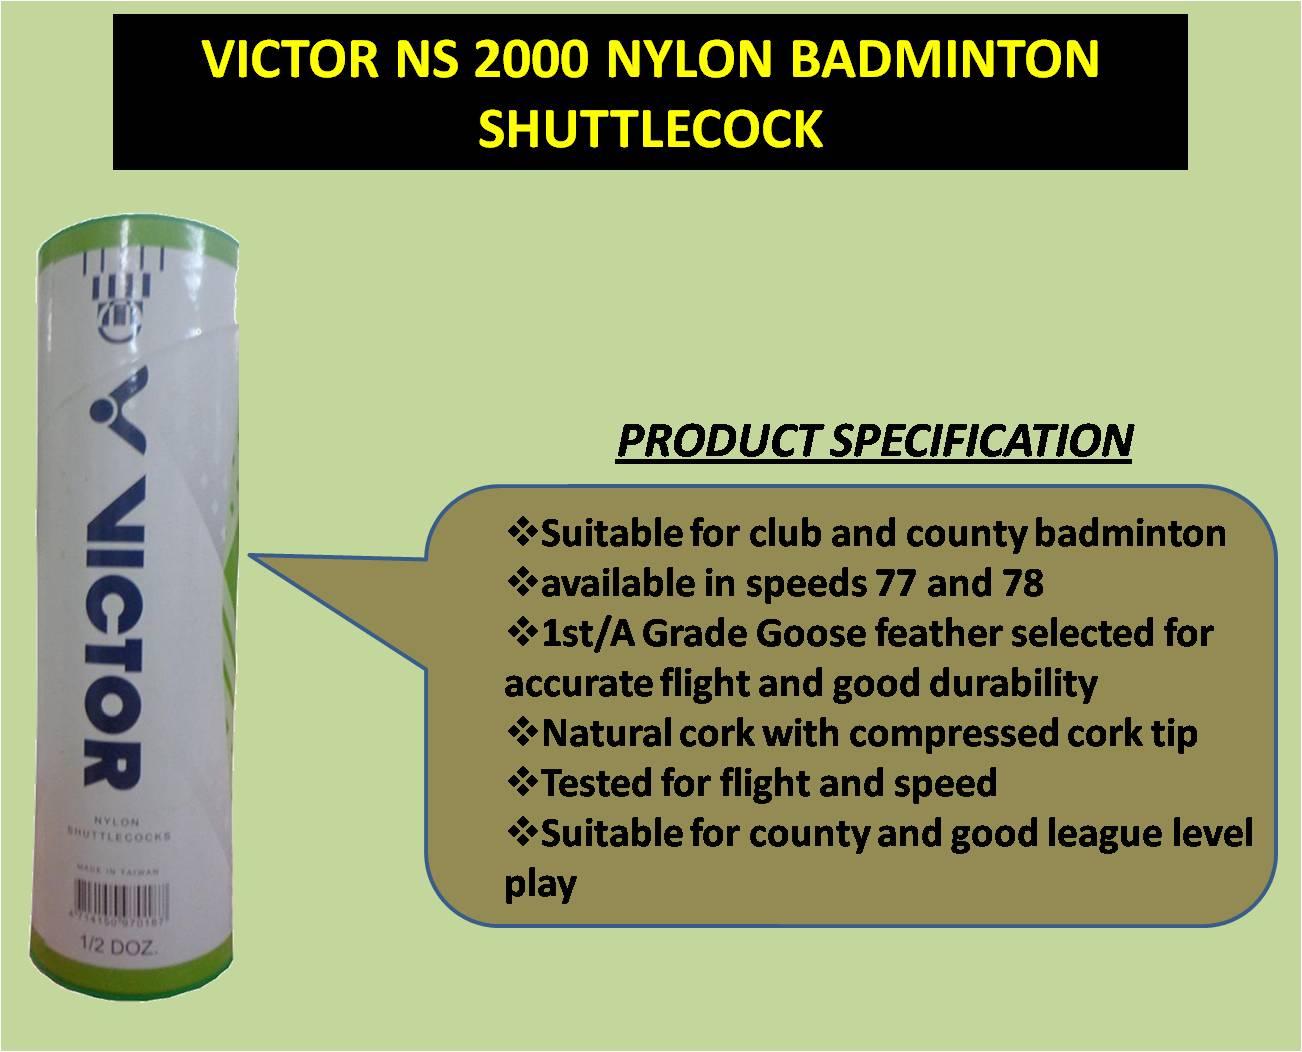 VICTOR NS 2000 NYLON BADMINTON SHUTTLECOCK